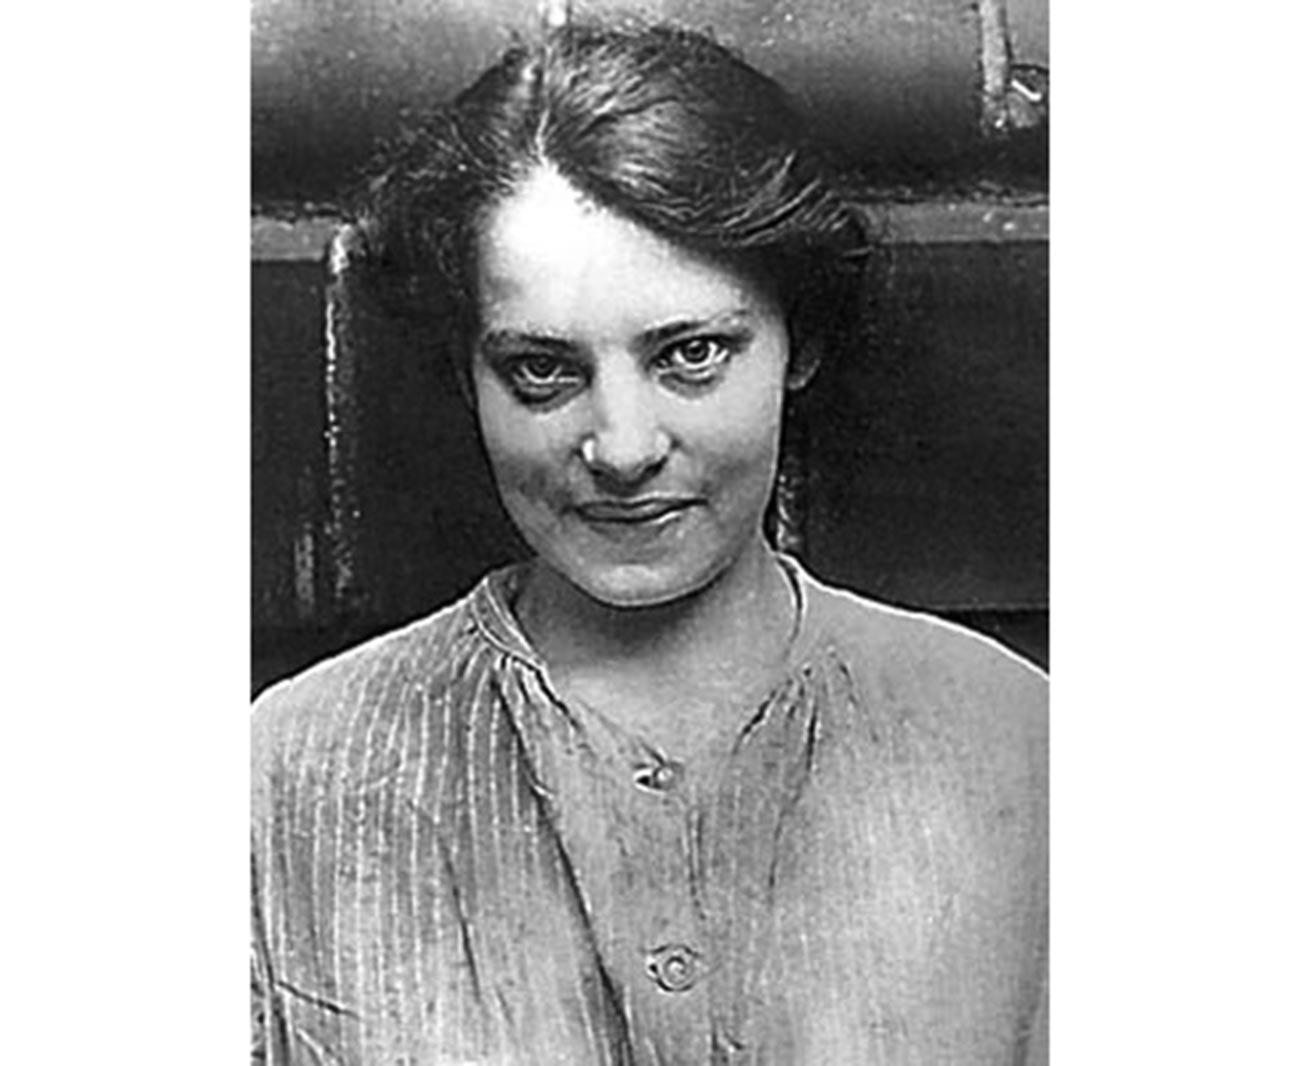 L'usurpatrice Anna Anderson, 1920